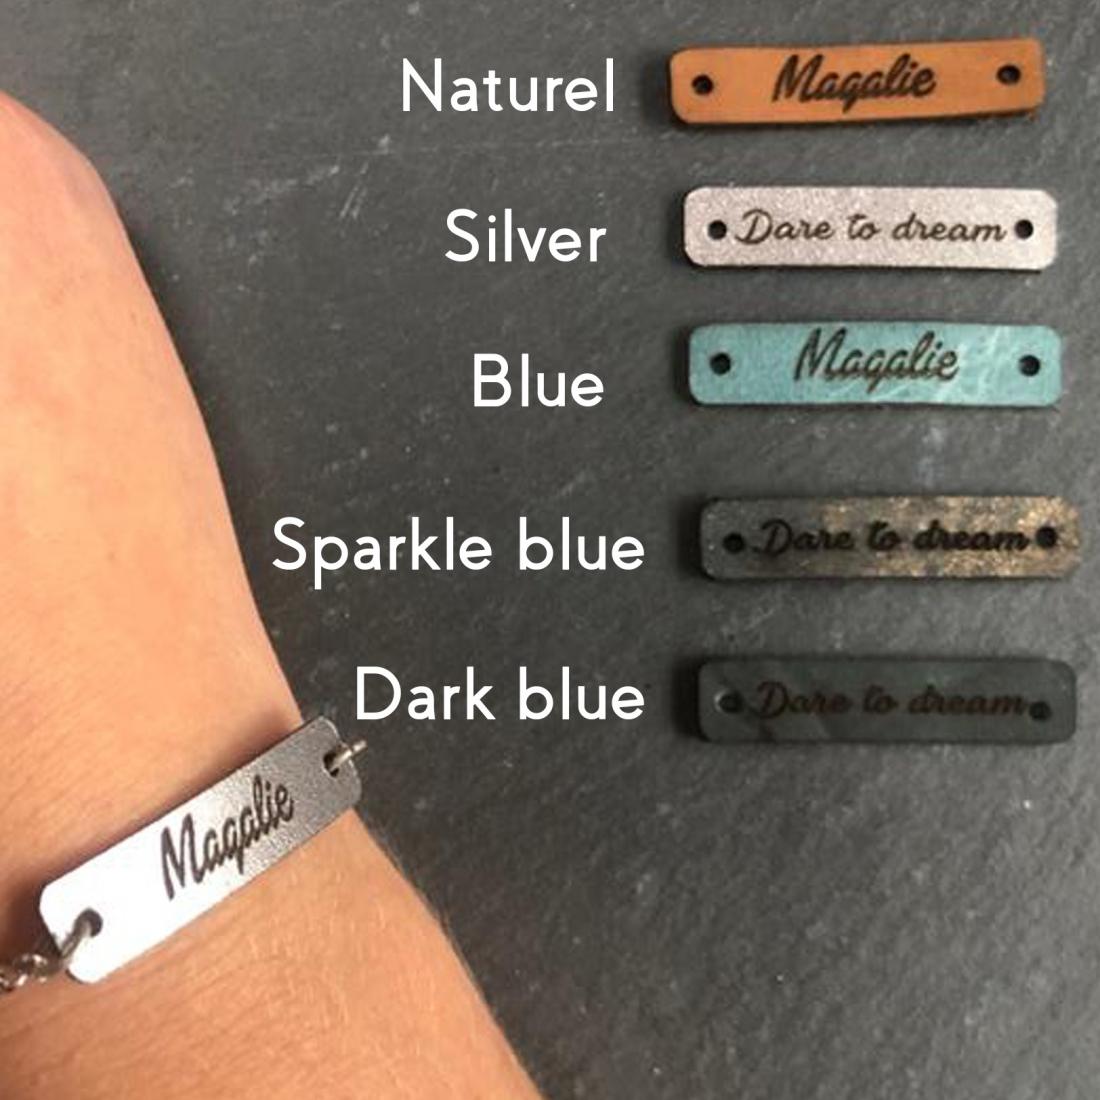 Leather bracelet tag